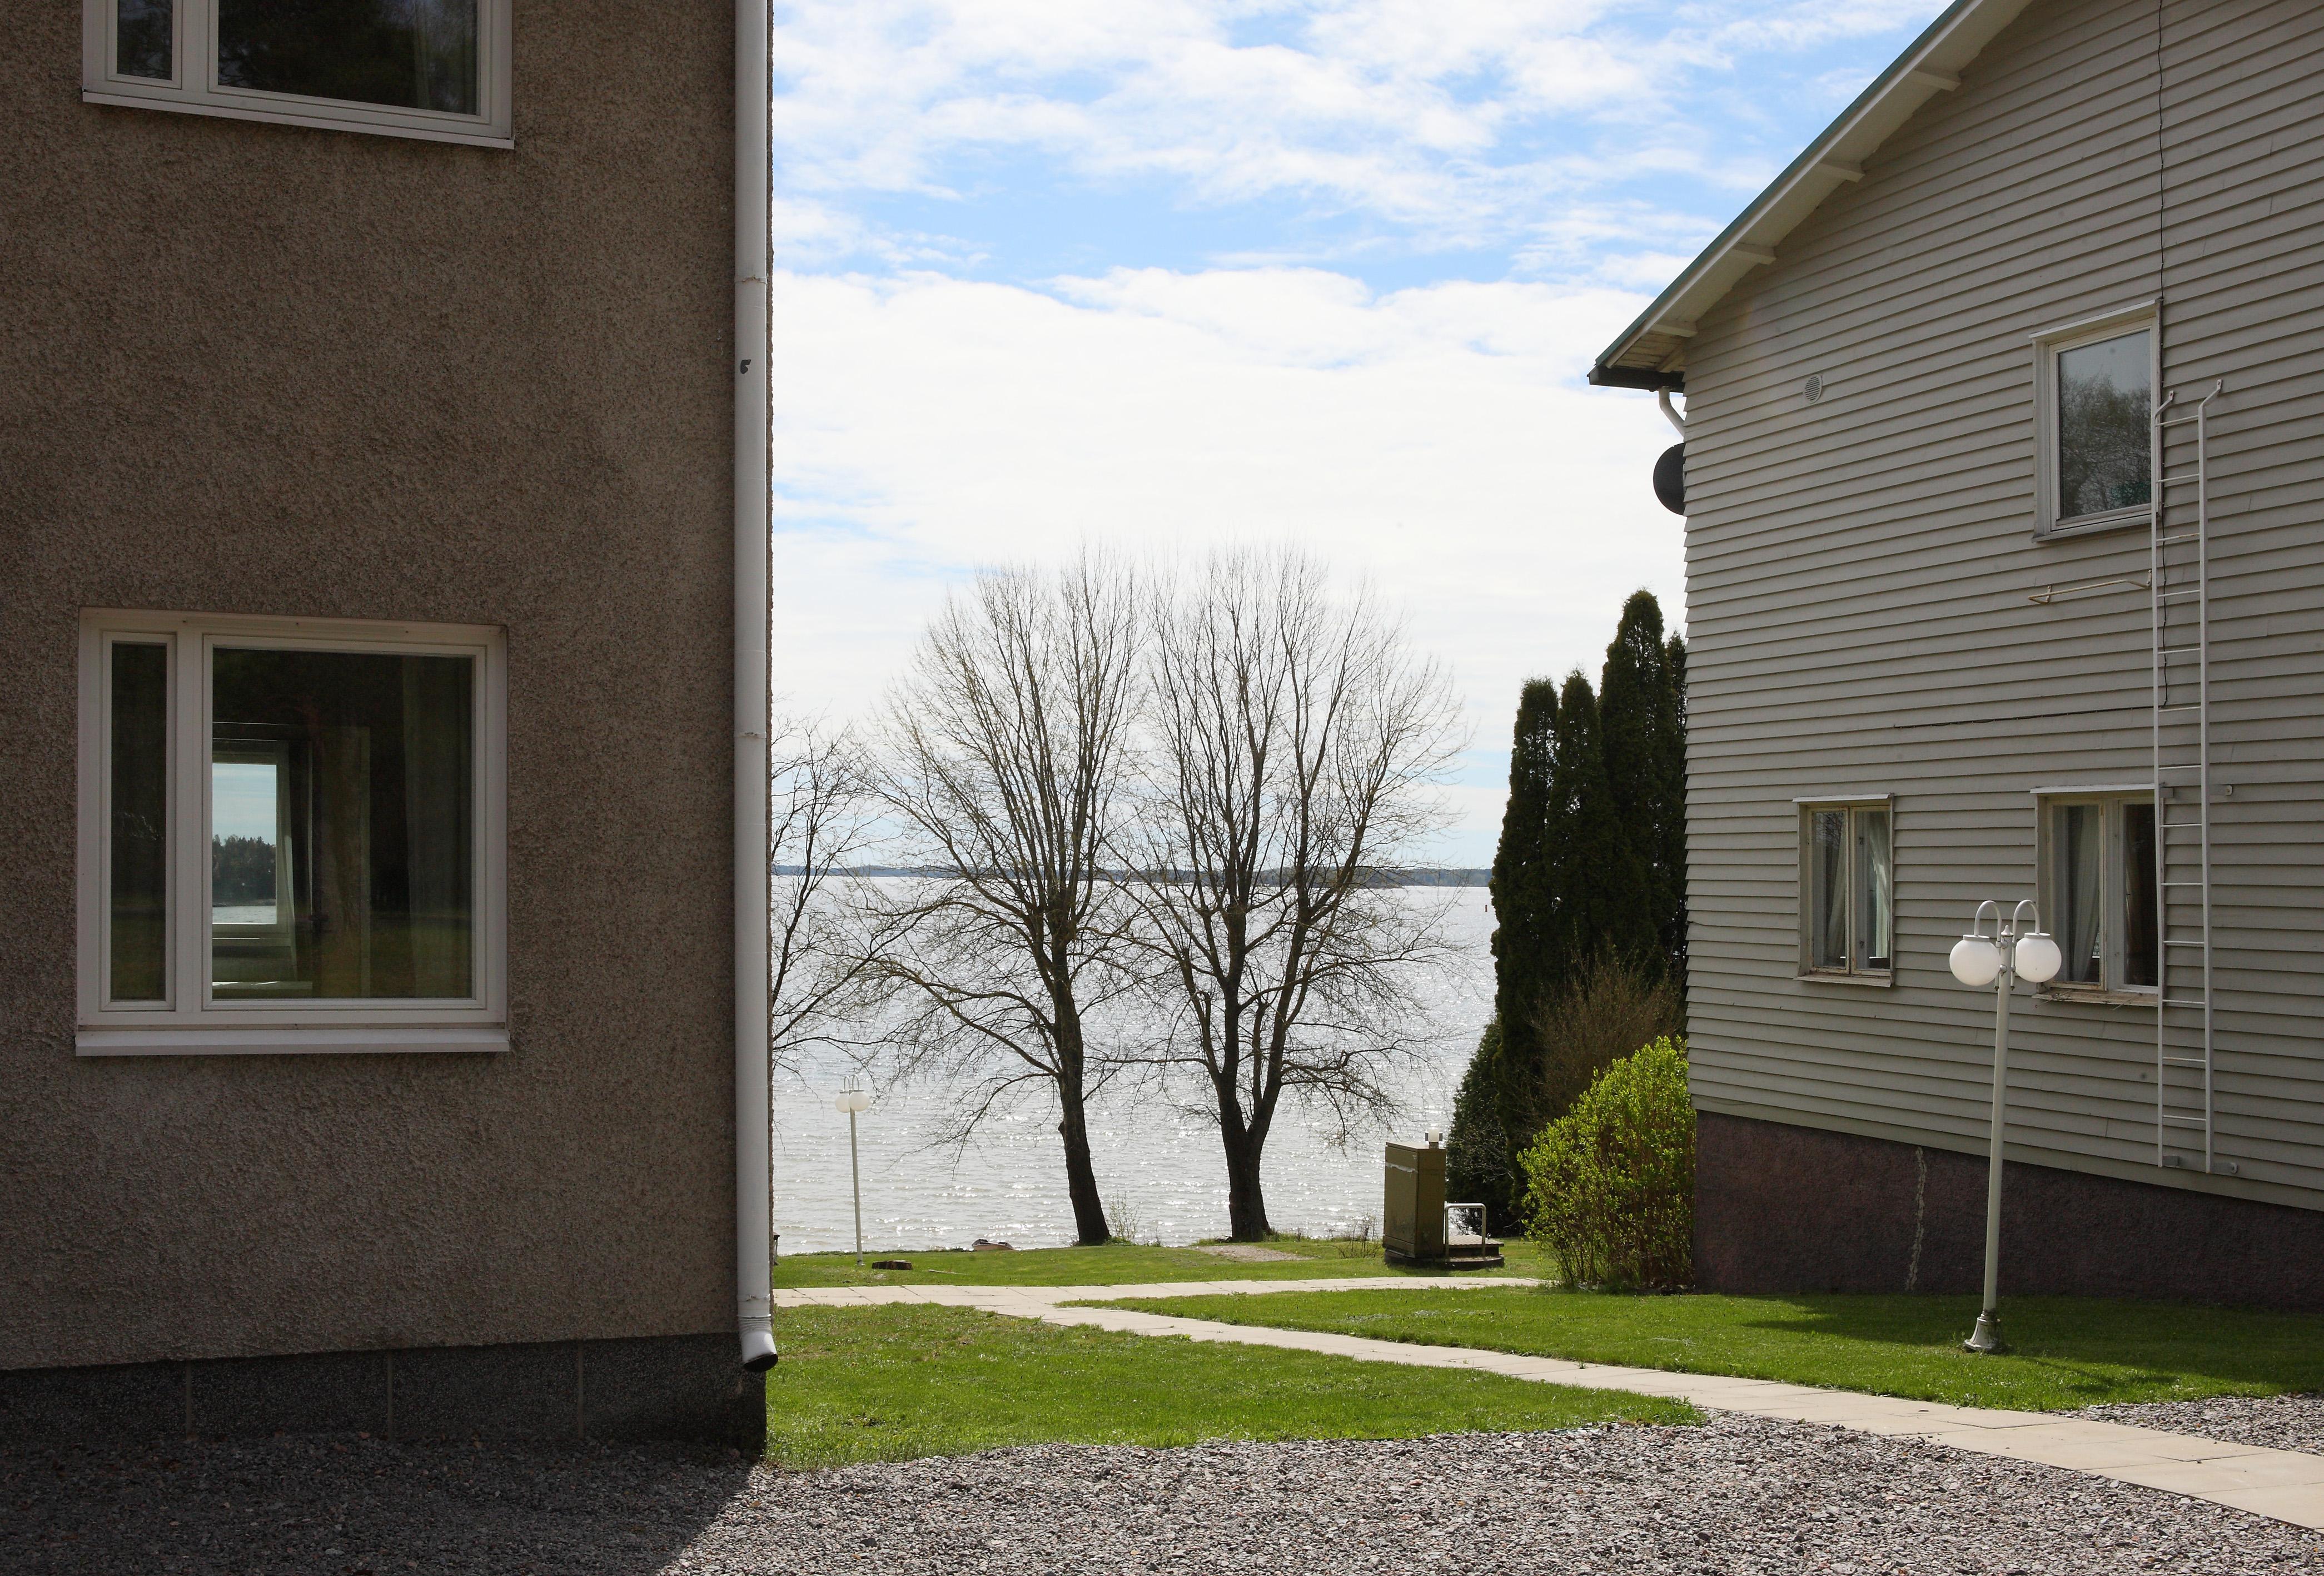 Sami Paananen